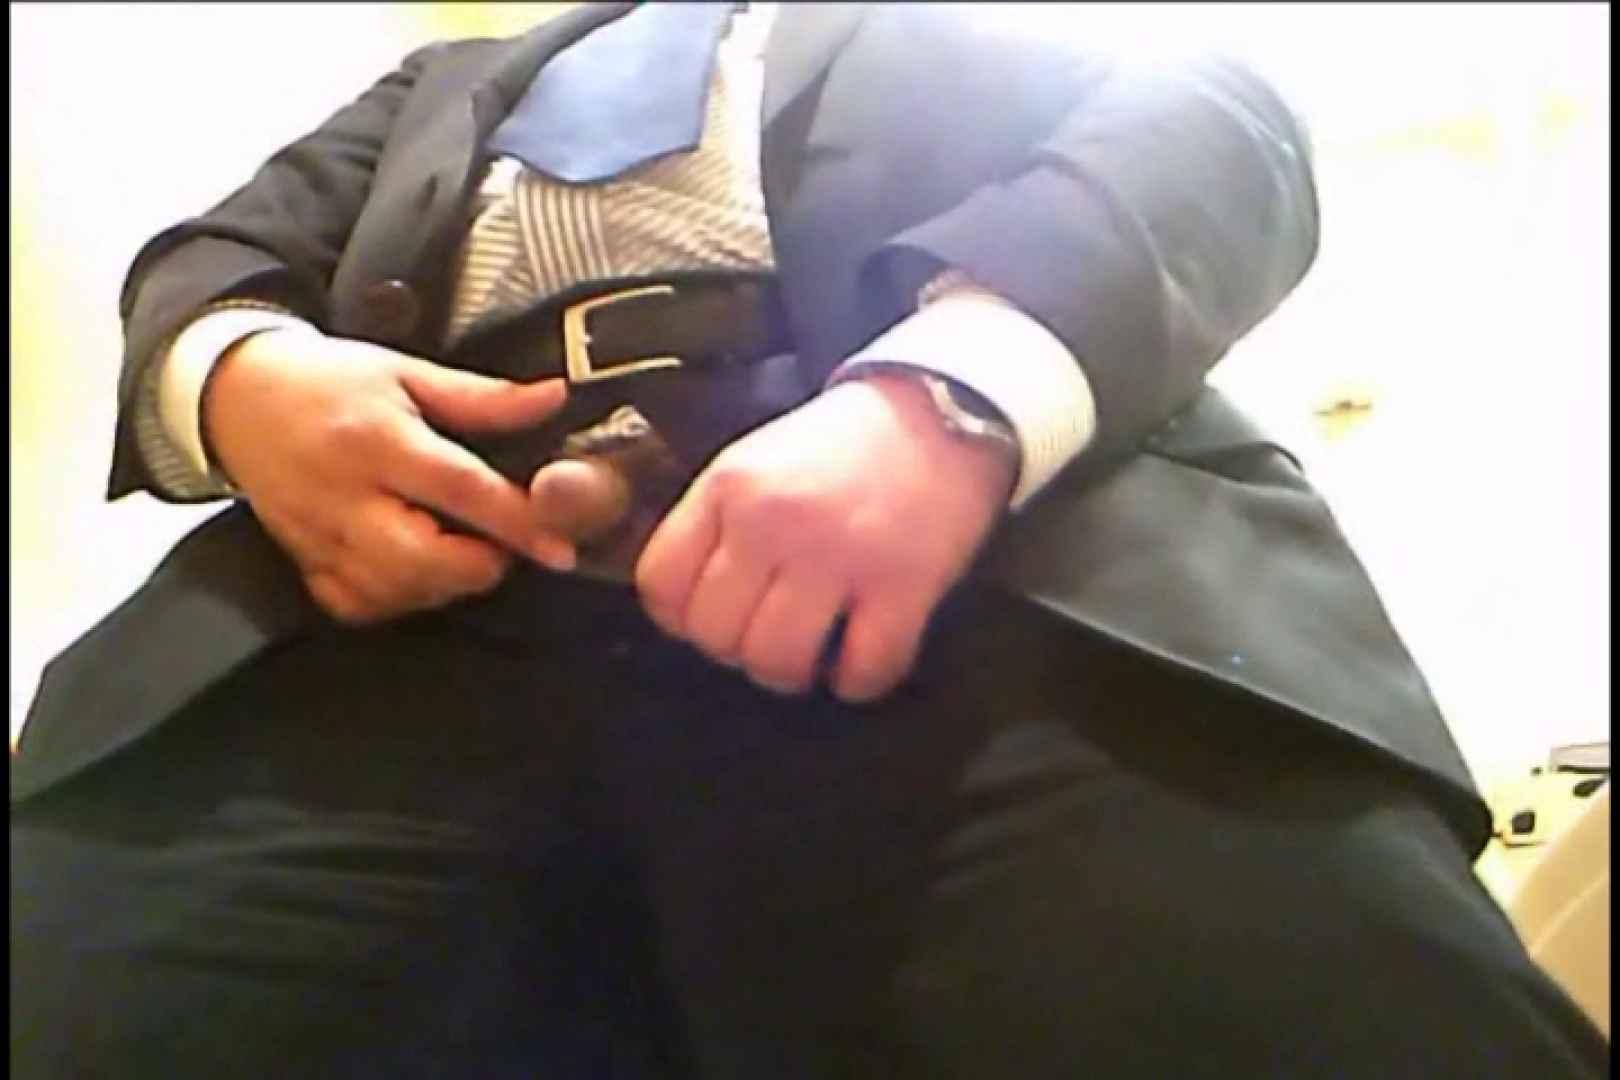 Gボーイ初投稿!掴み取りさんの洗面所覗き!in新幹線!VOL.05 おやじ熊系な男たち ゲイ無修正動画画像 63連発 38